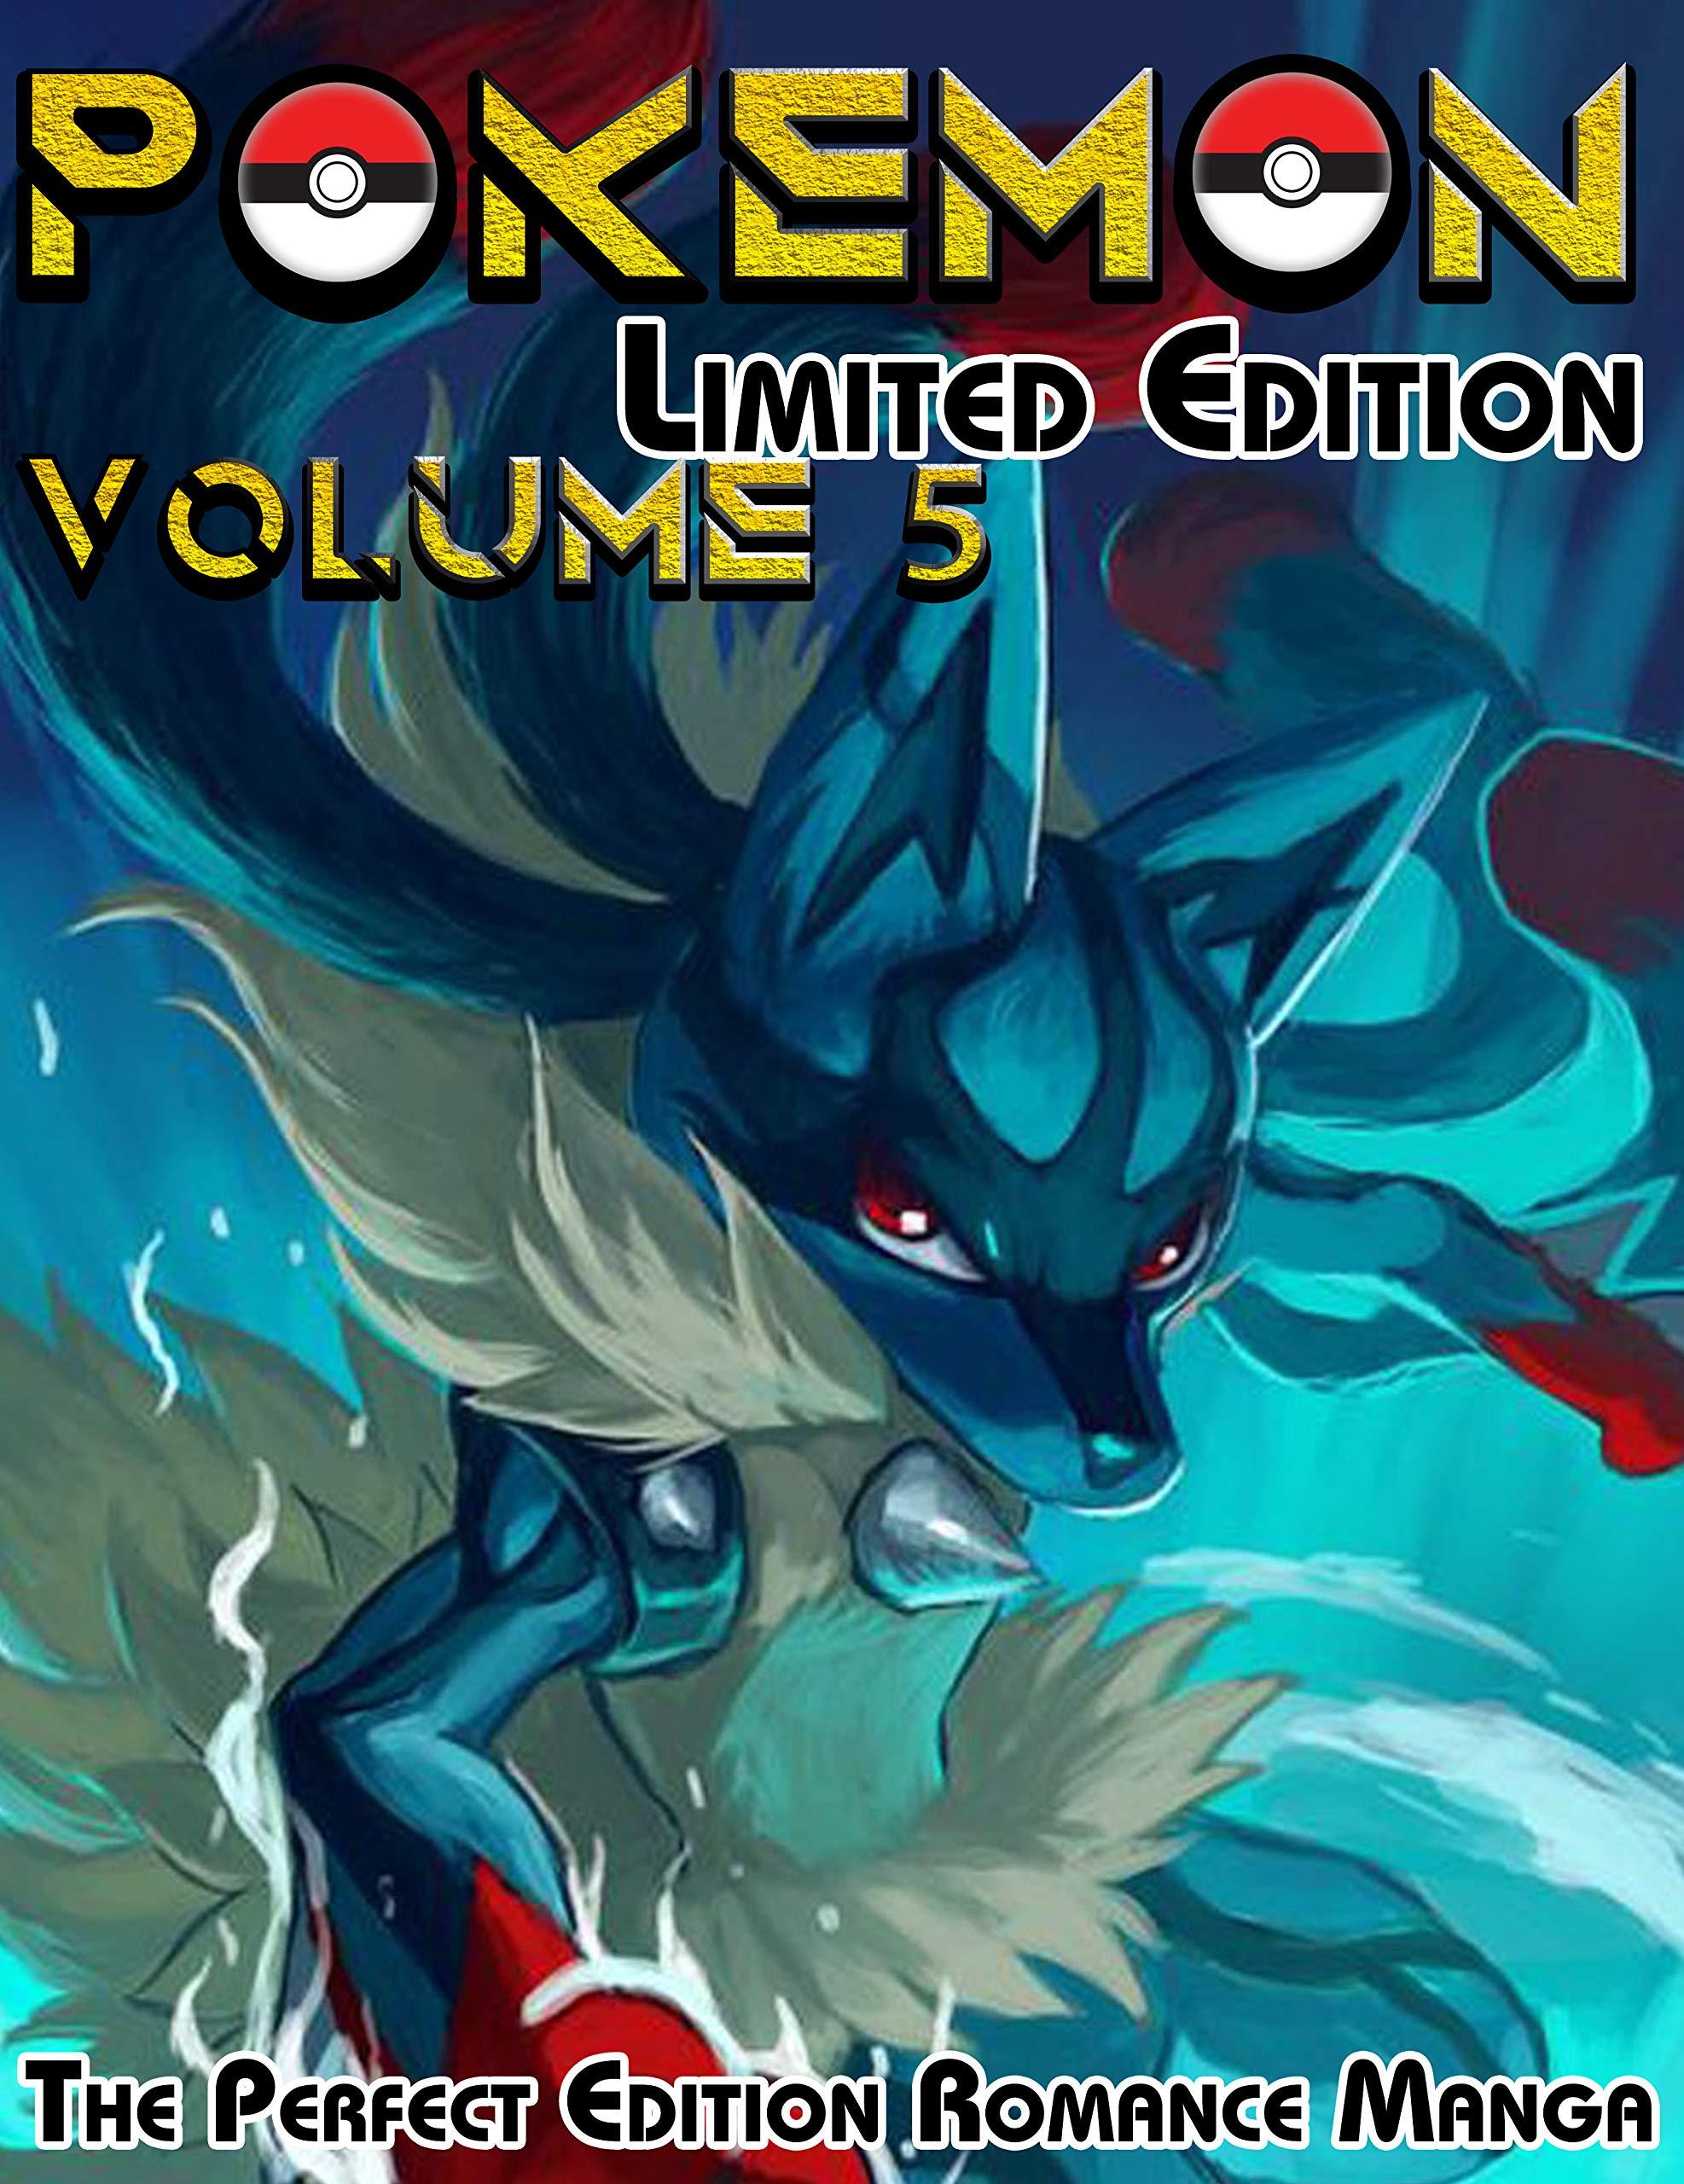 The Perfect Edition Romance Manga Pokemon Limited Edition: Complete Series Pokemon Volume 5